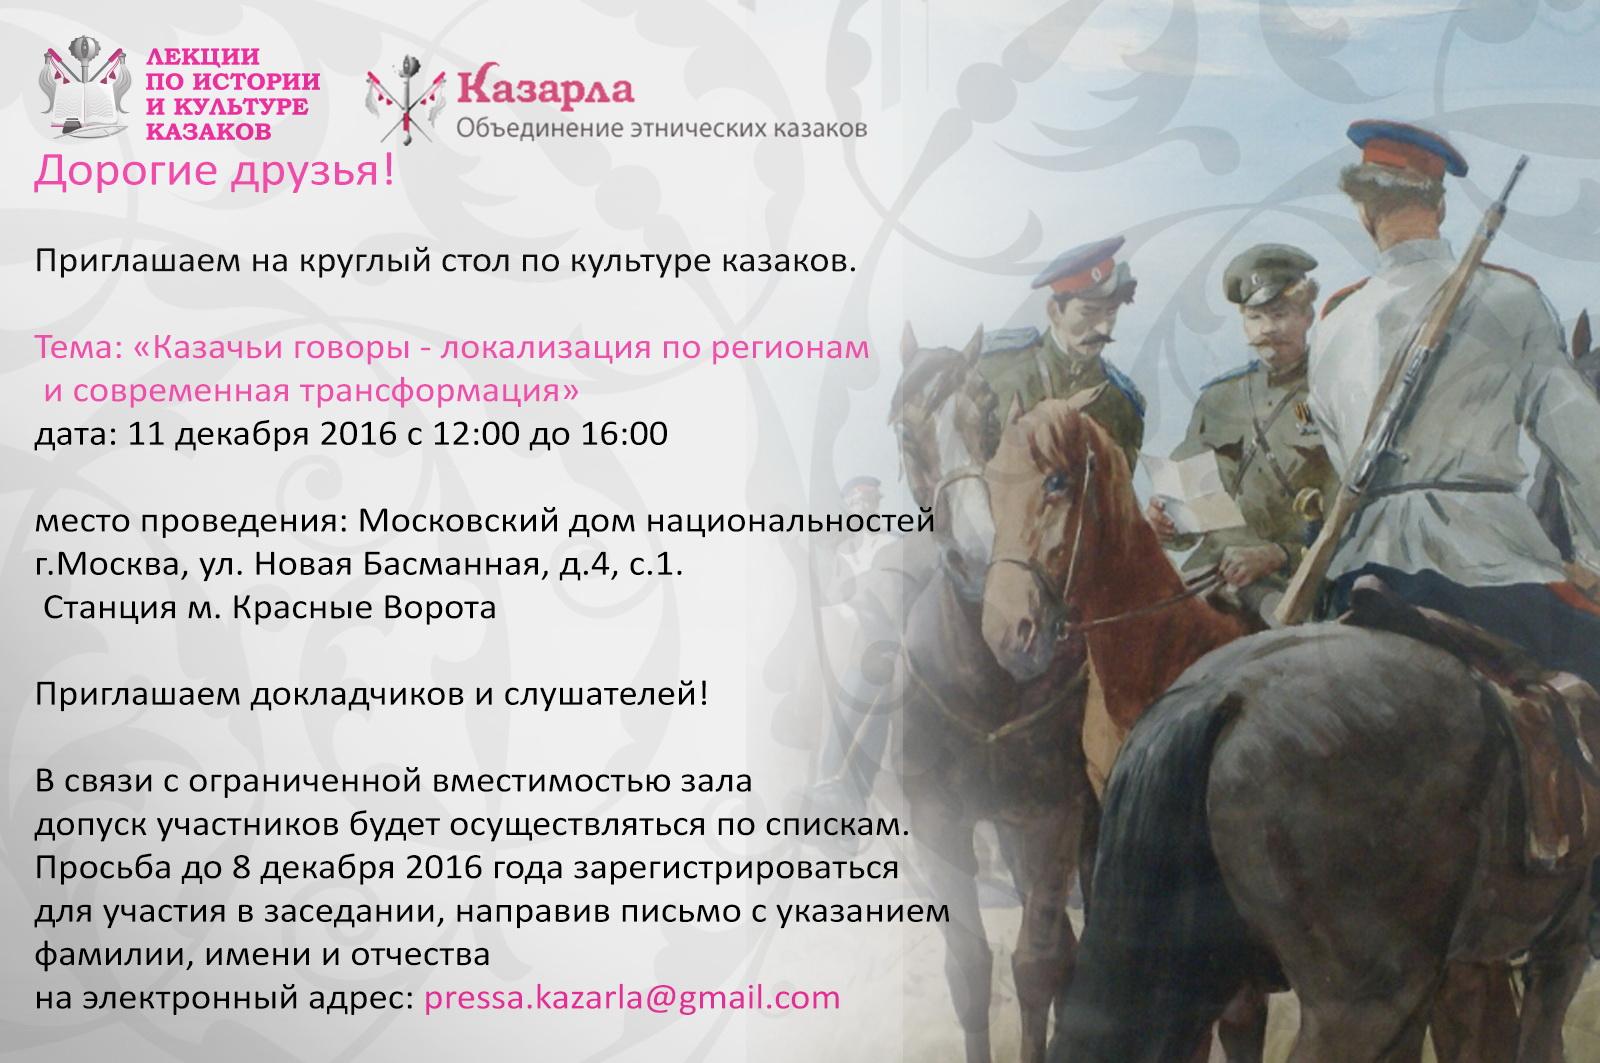 lektsii-11-dekabrya